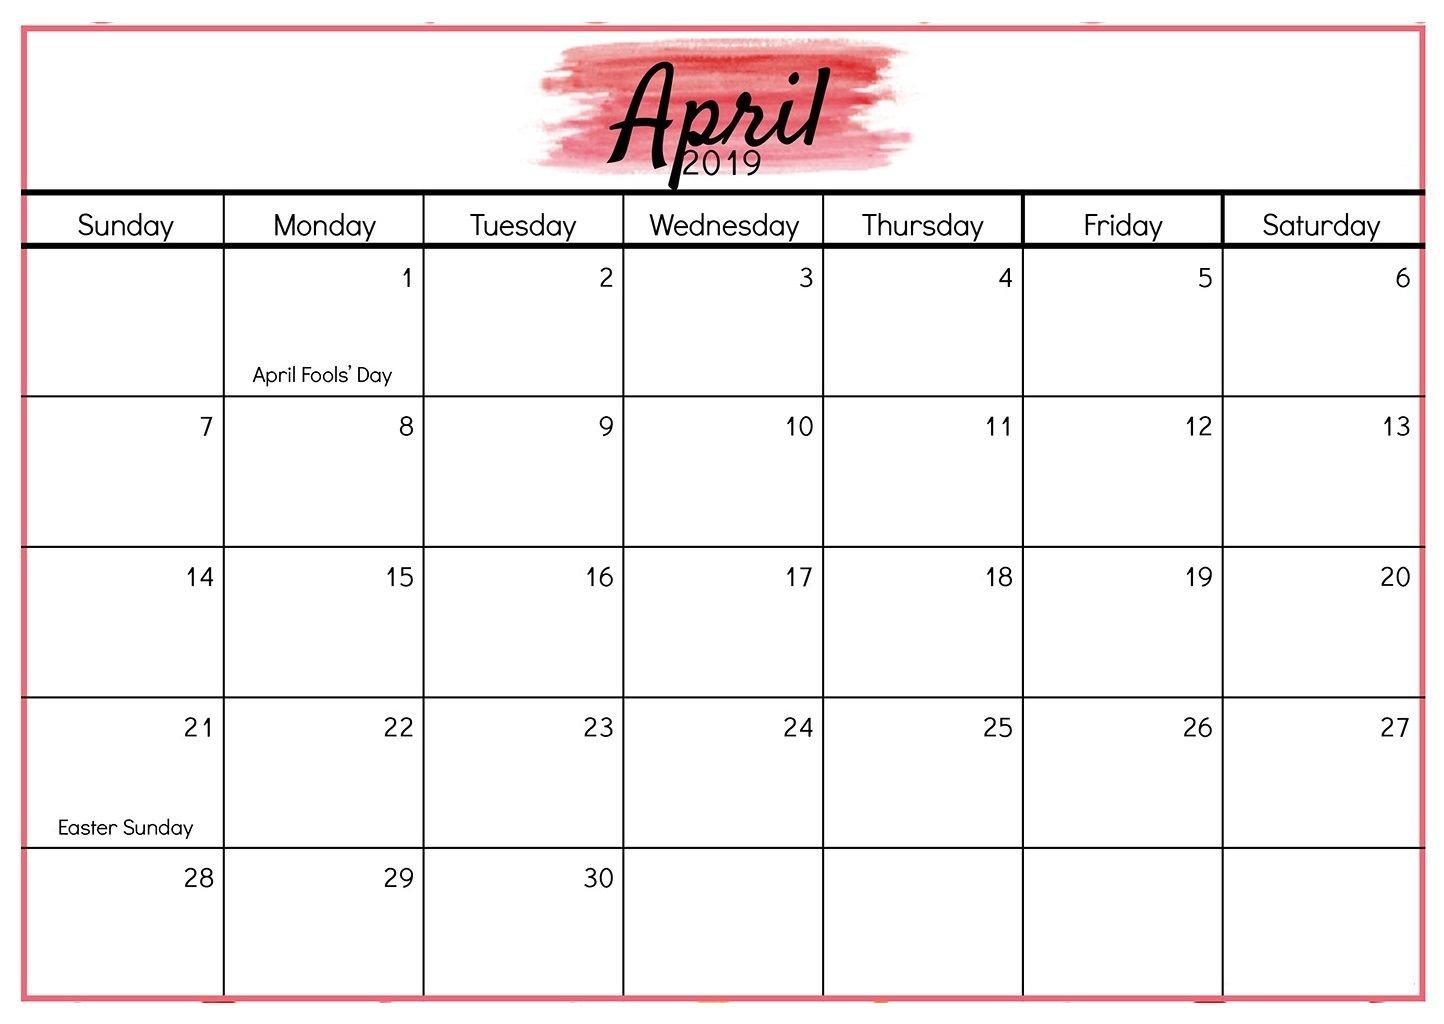 Editable April 2019 Word Calendar Templates | Calendar Calendar 2 Week Block Printable Free April